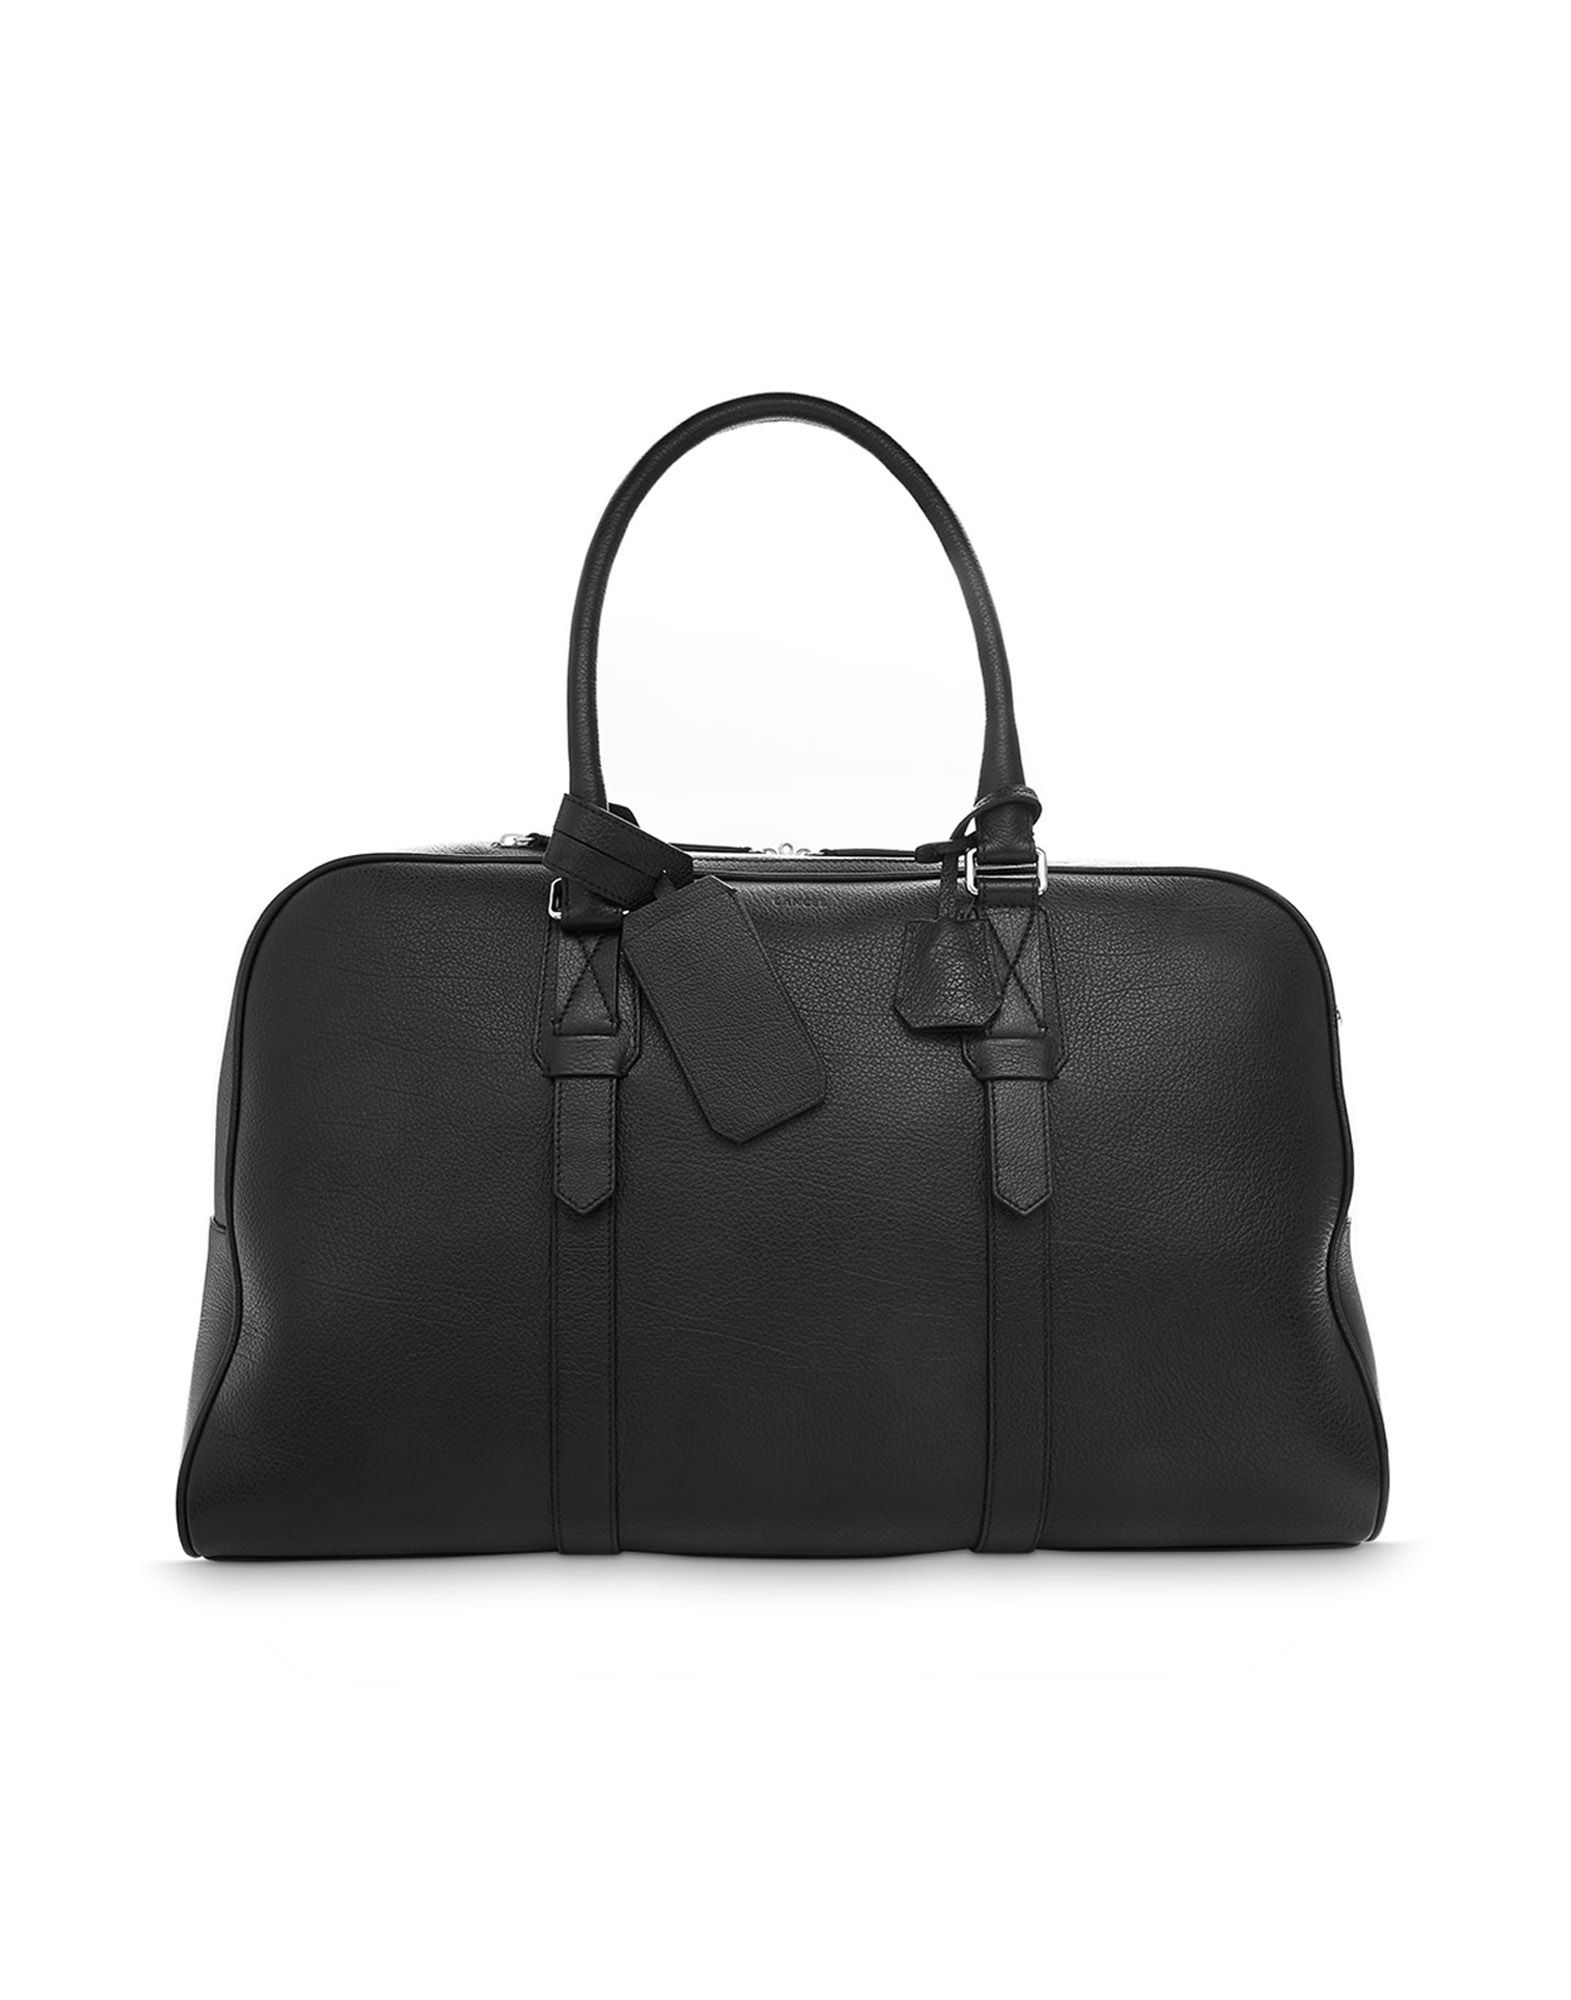 Trussardi LUGGAGE - Beauty cases su YOOX.COM DFAqqUA5Hr